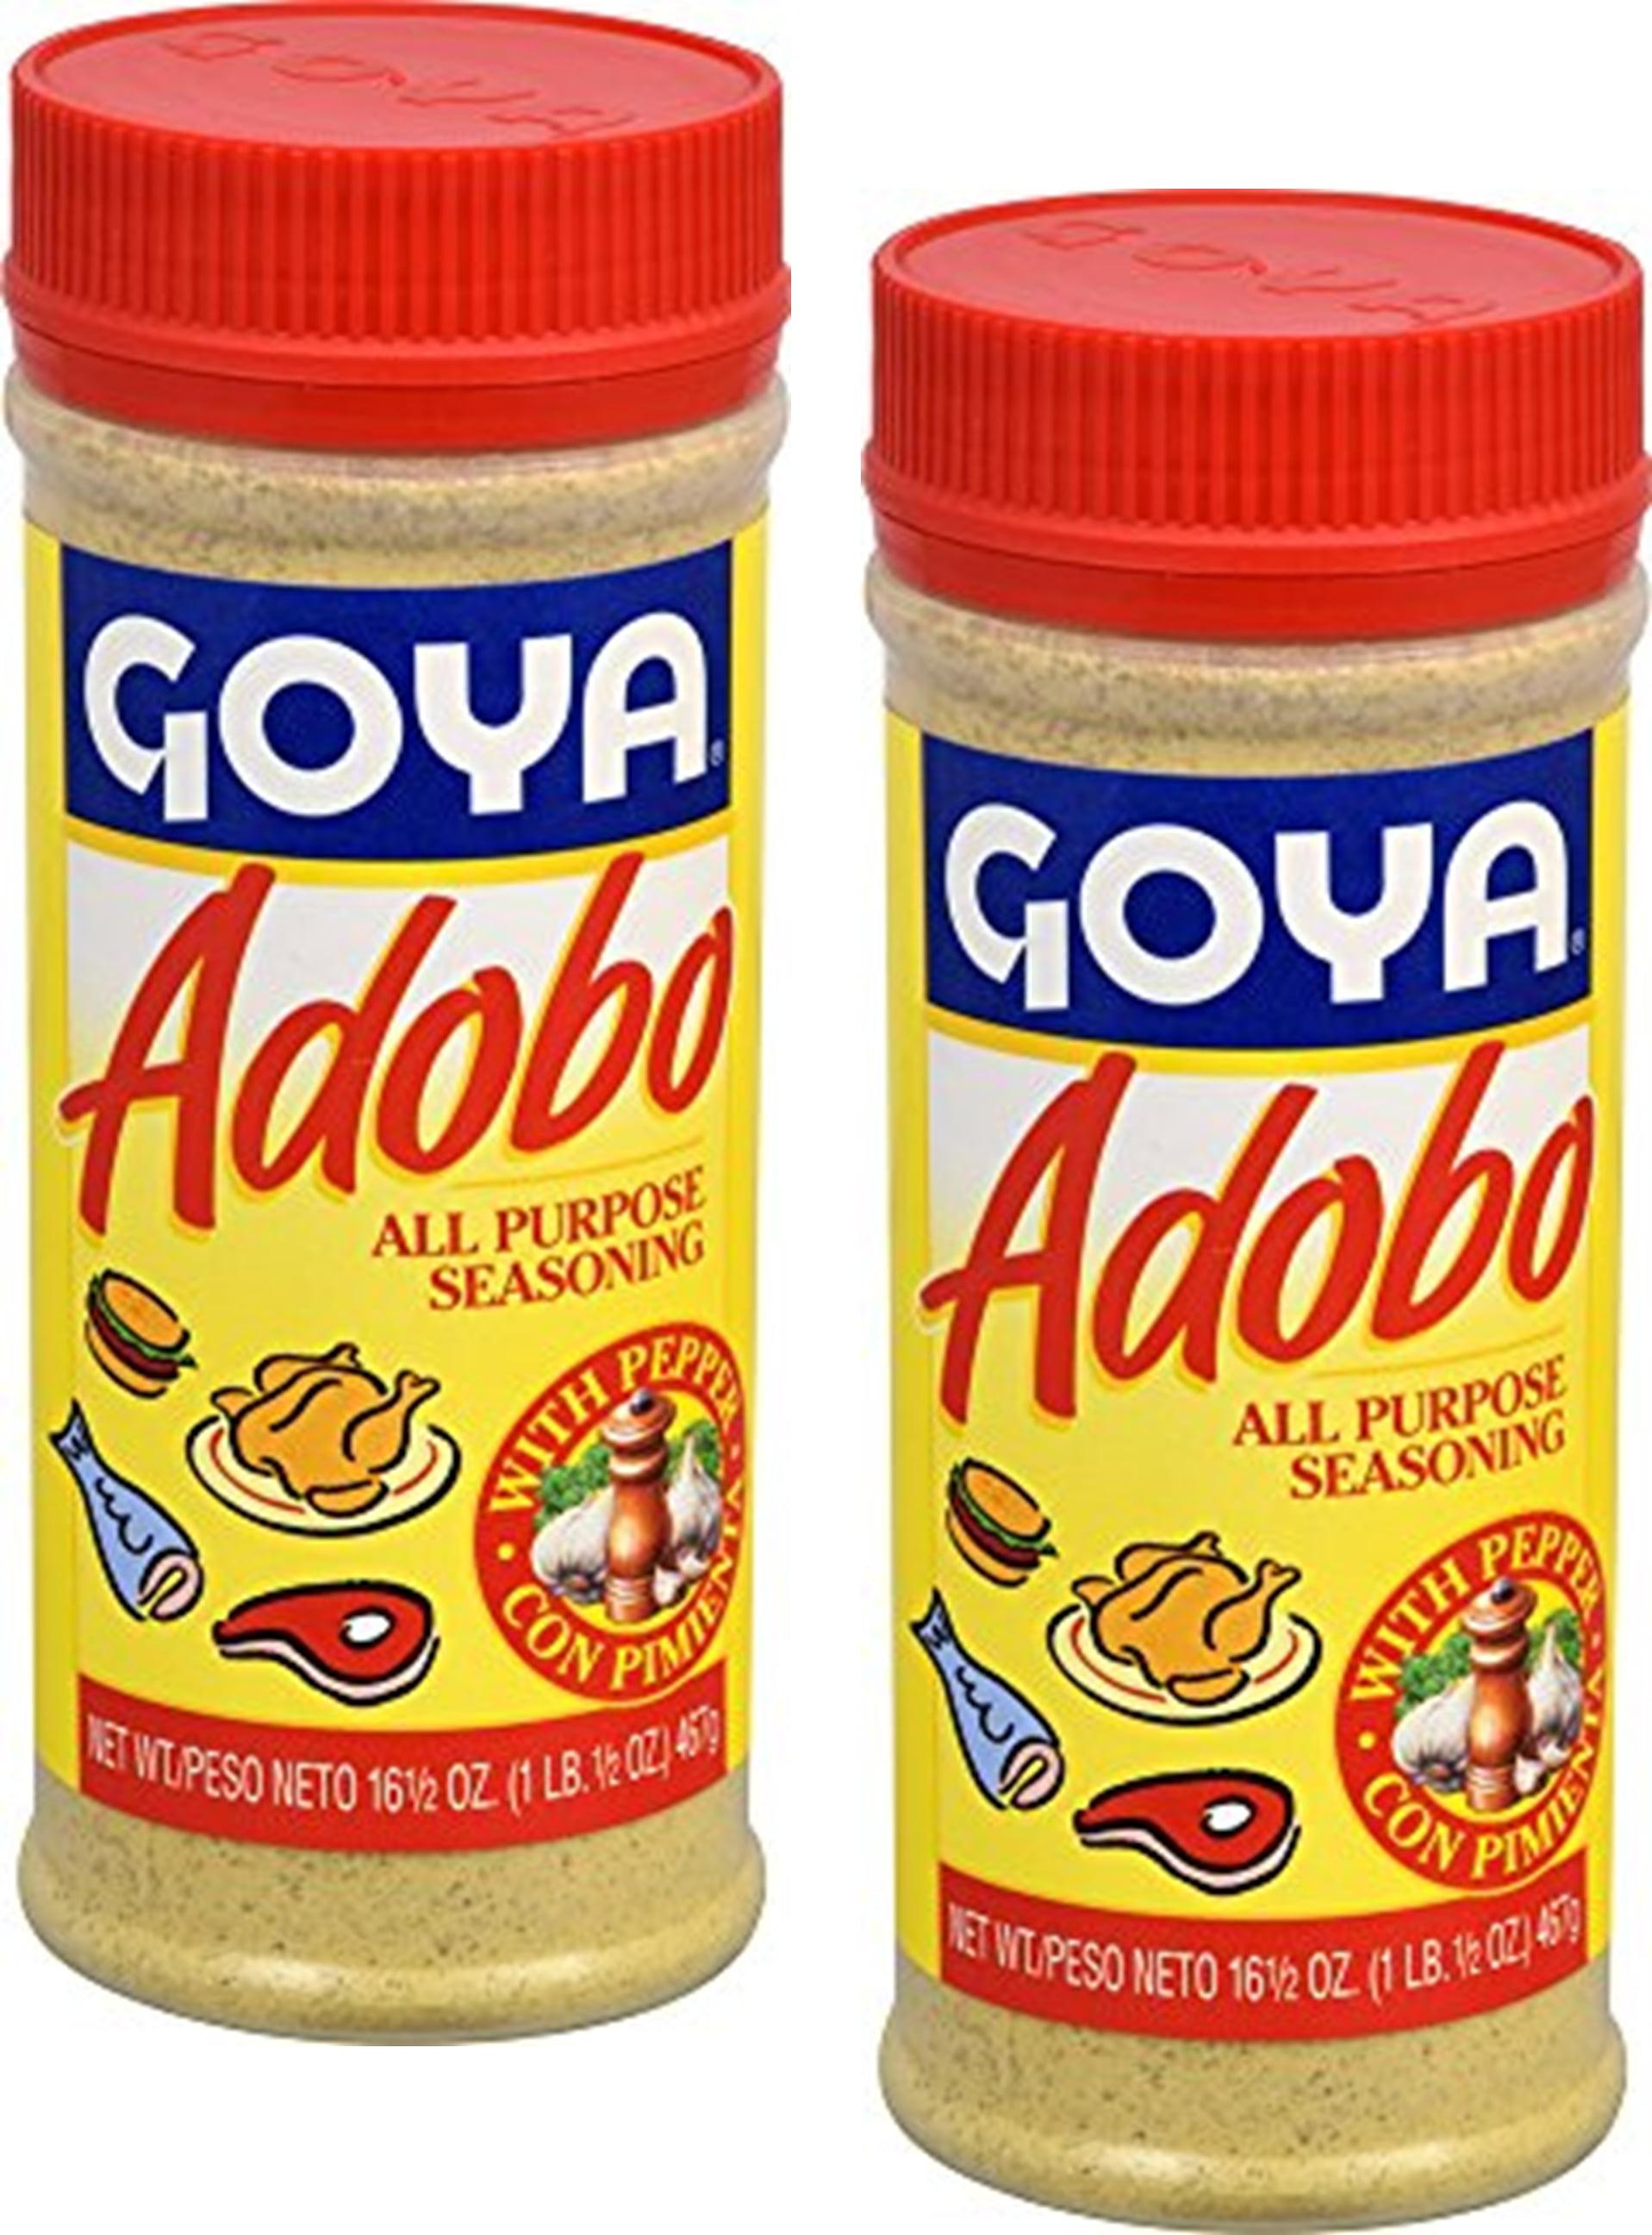 Goya Adobo All Purpose Seasoning With Pepper 16 5 Oz Pack Of 2 Walmart Com Walmart Com